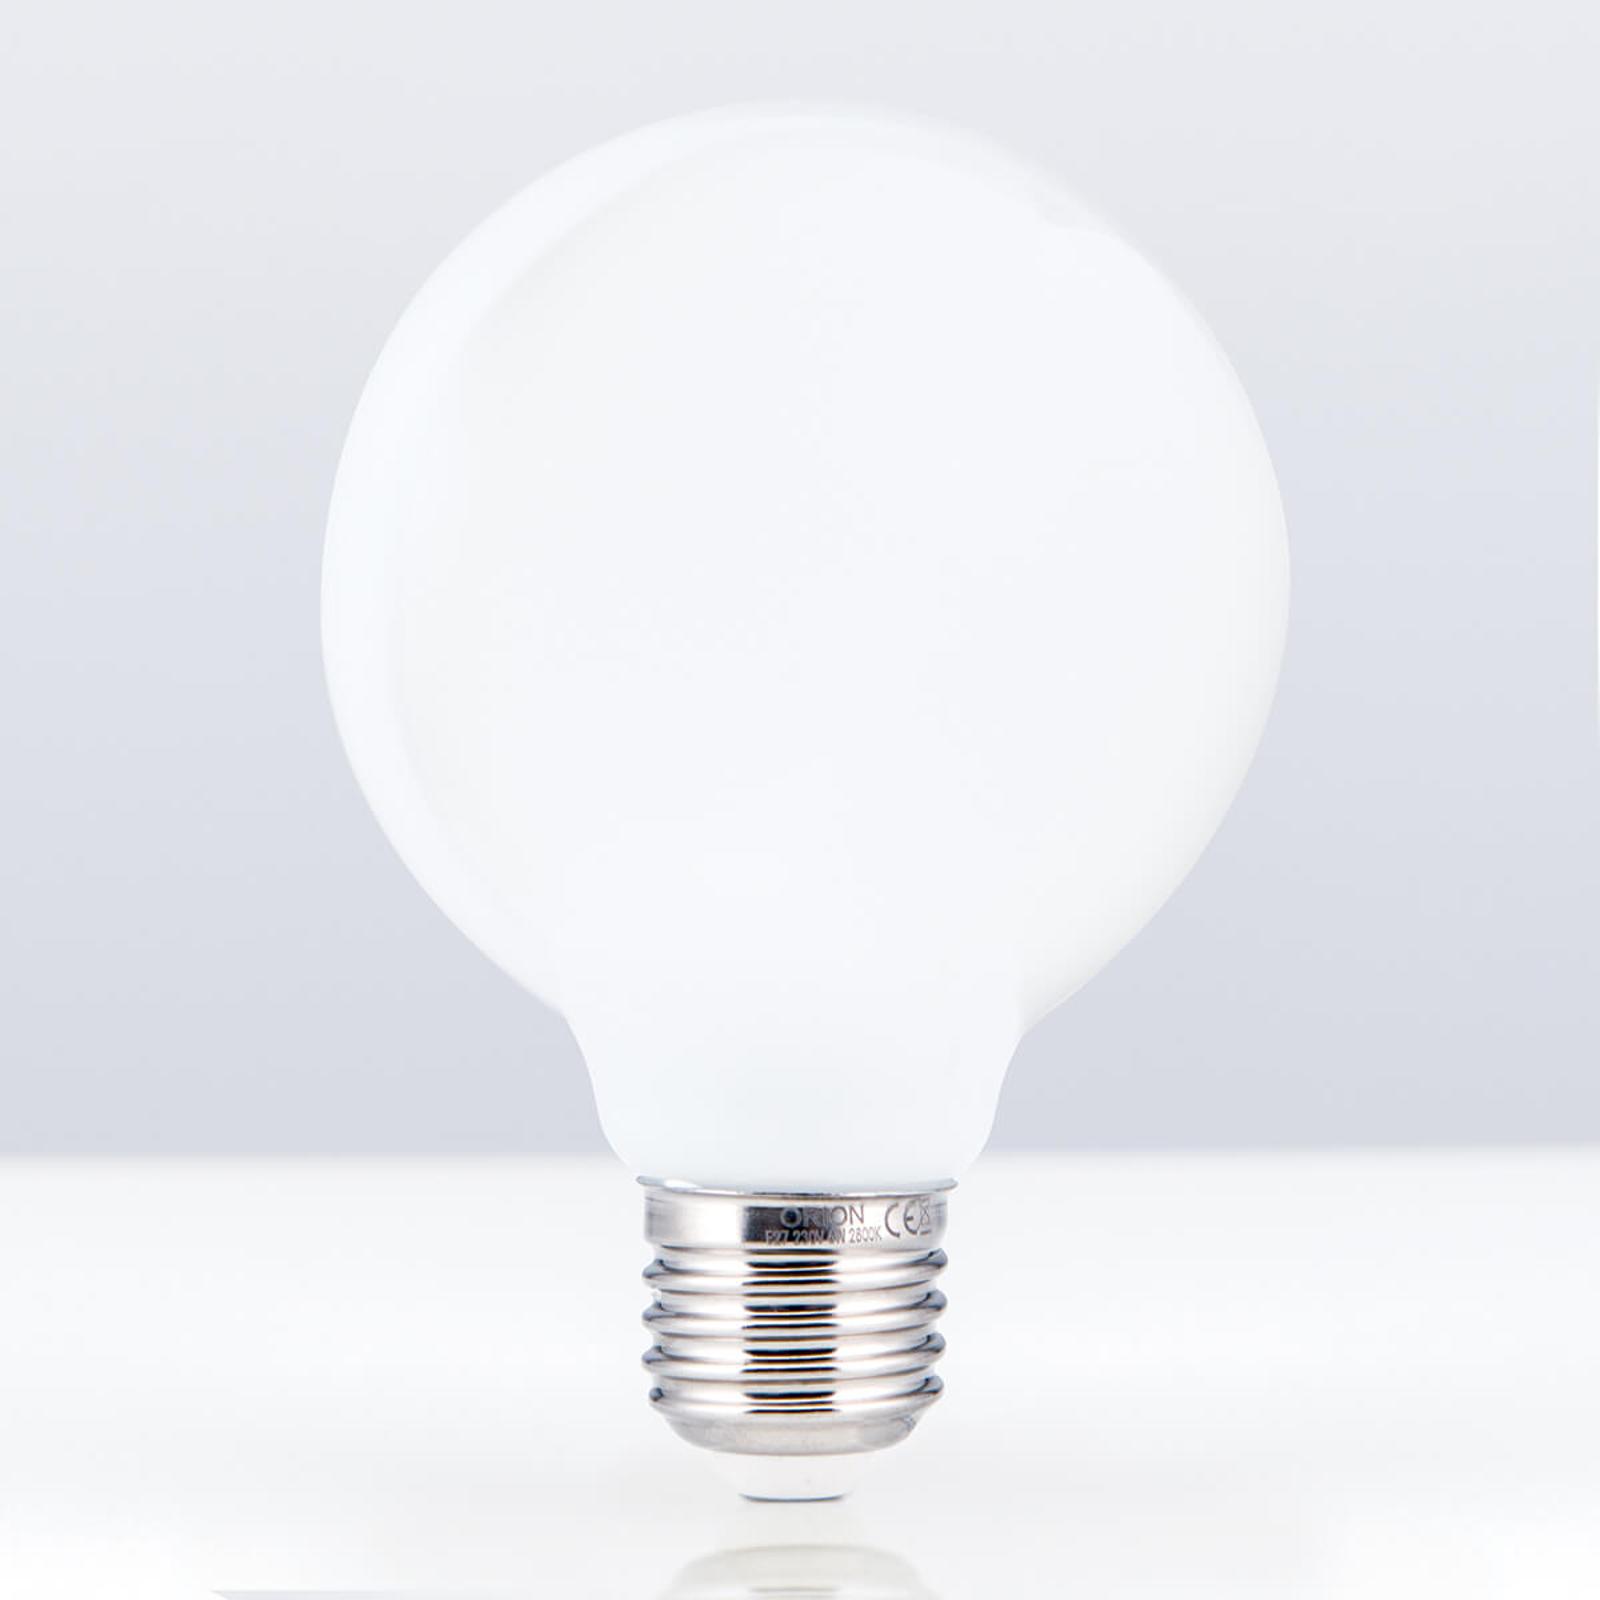 E27 8W 828 kulista żarówka LED G95opal